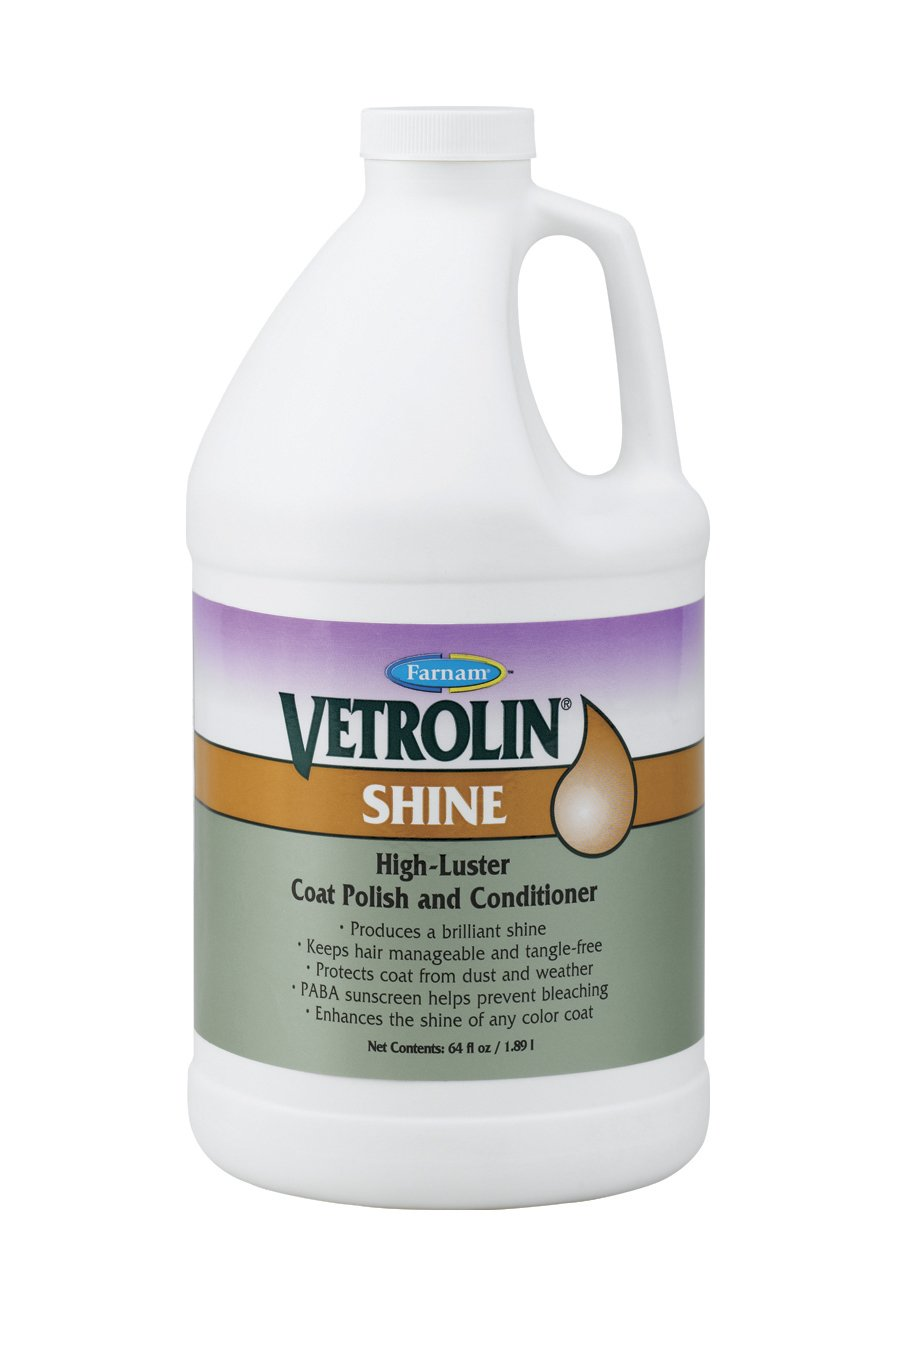 Vetrolin Farnam Shine High-Luster Coat Polish and Conditioner Refill, 64 fl. oz.